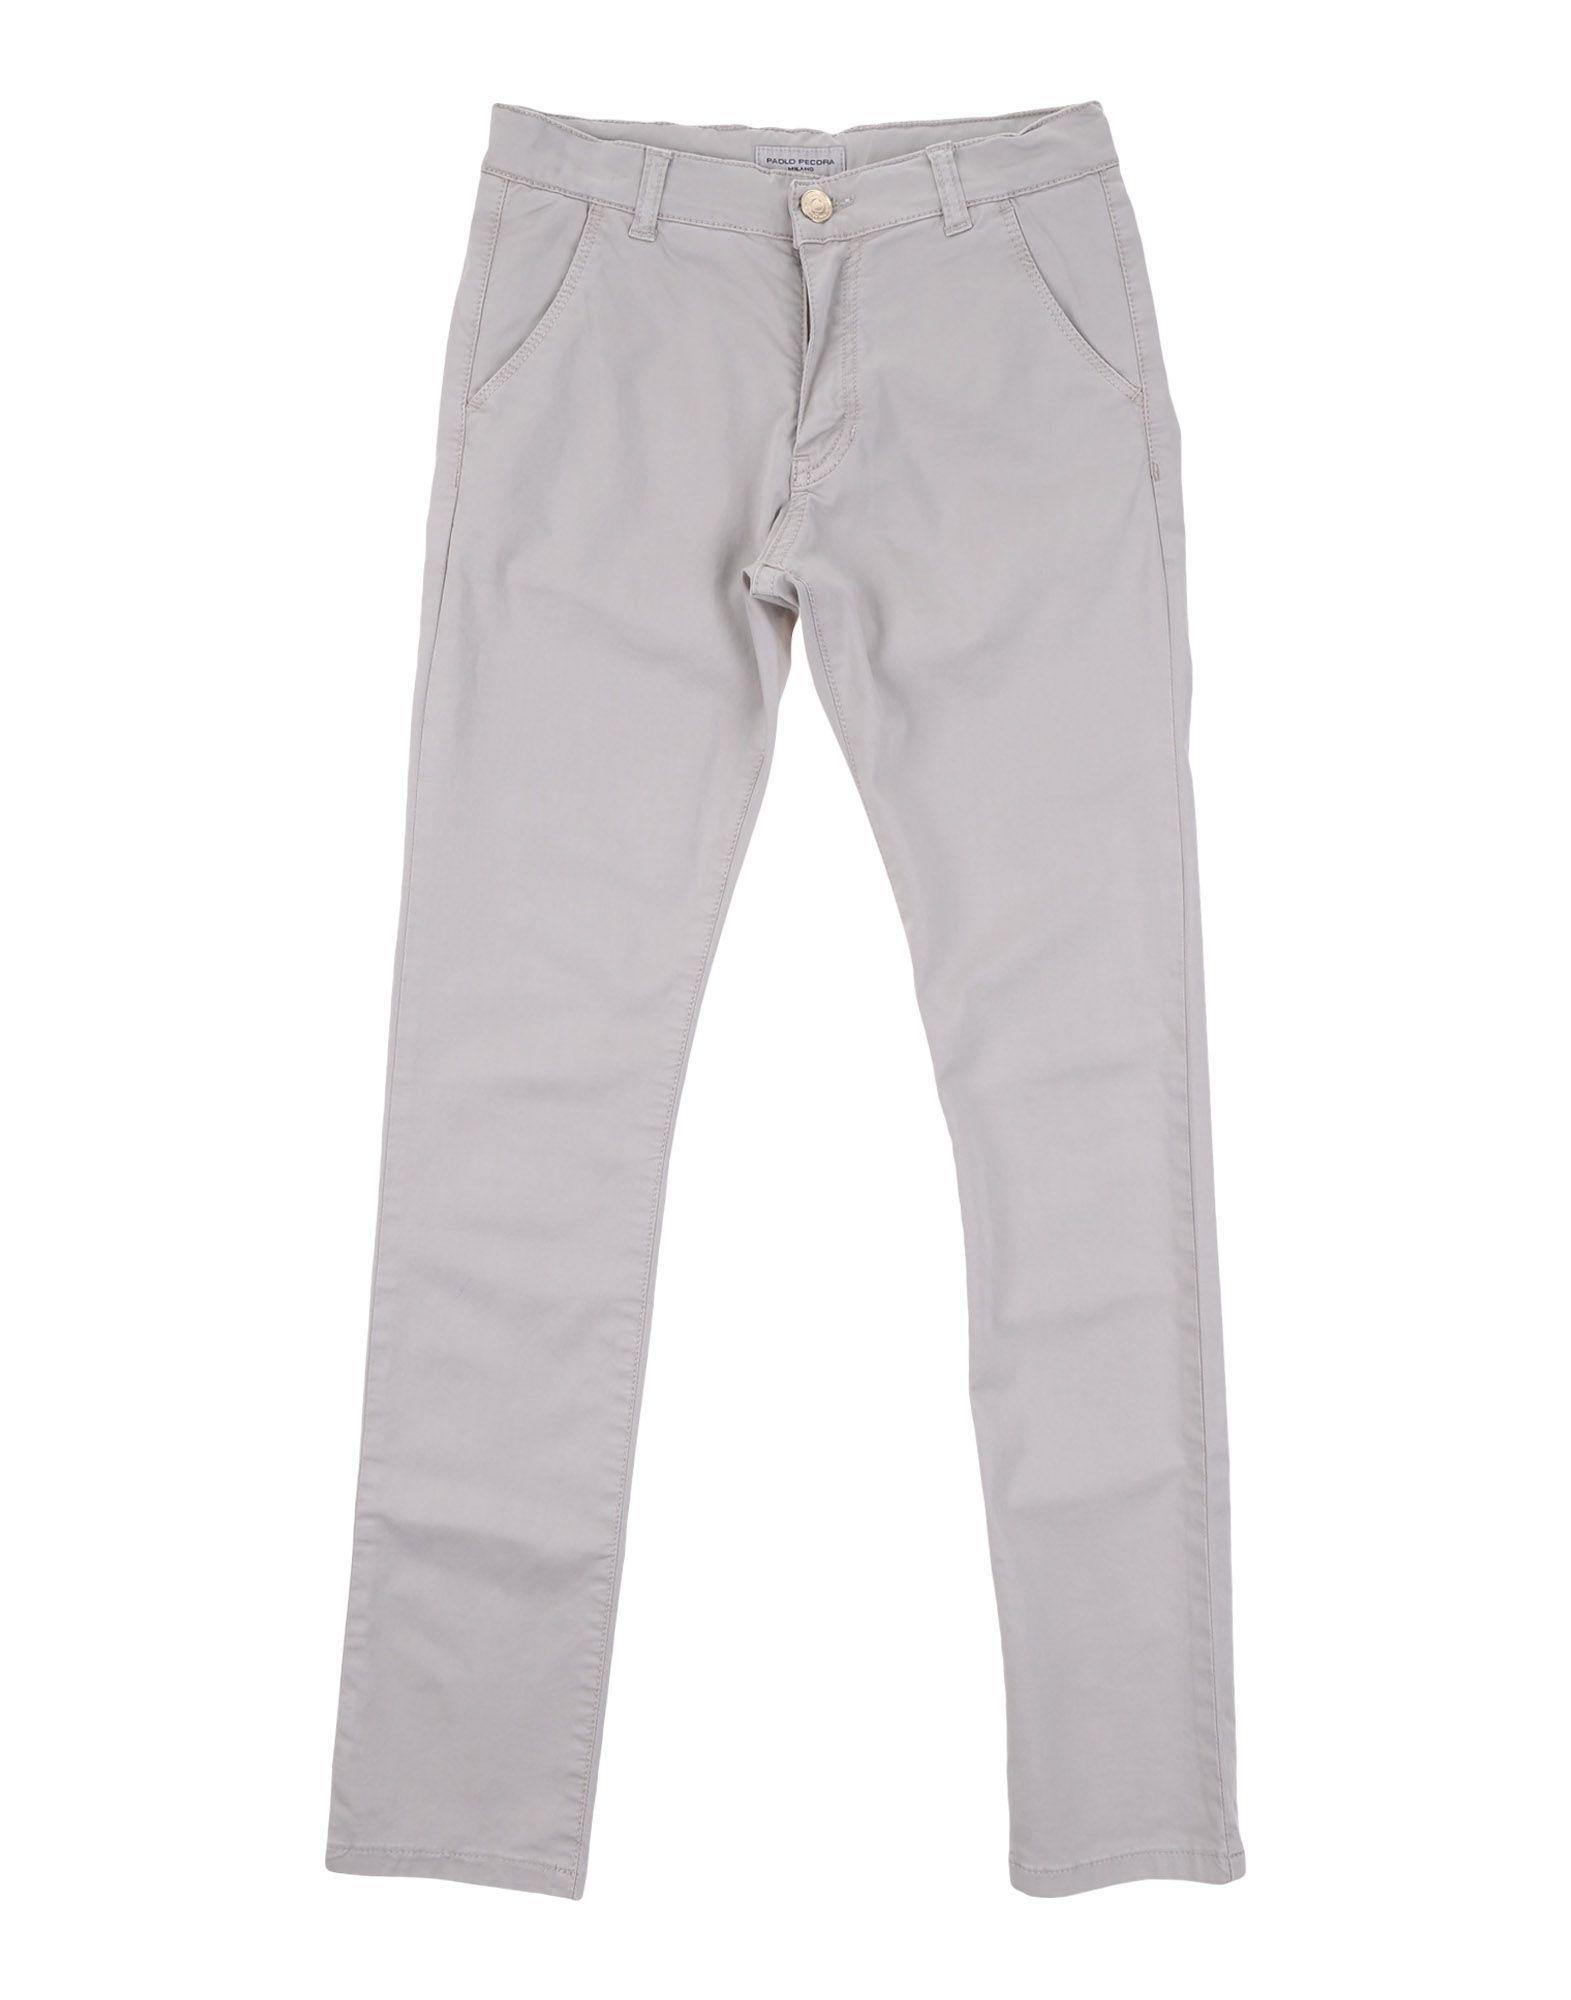 Paolo Pecora Boy Casual trousers Light grey Cotton